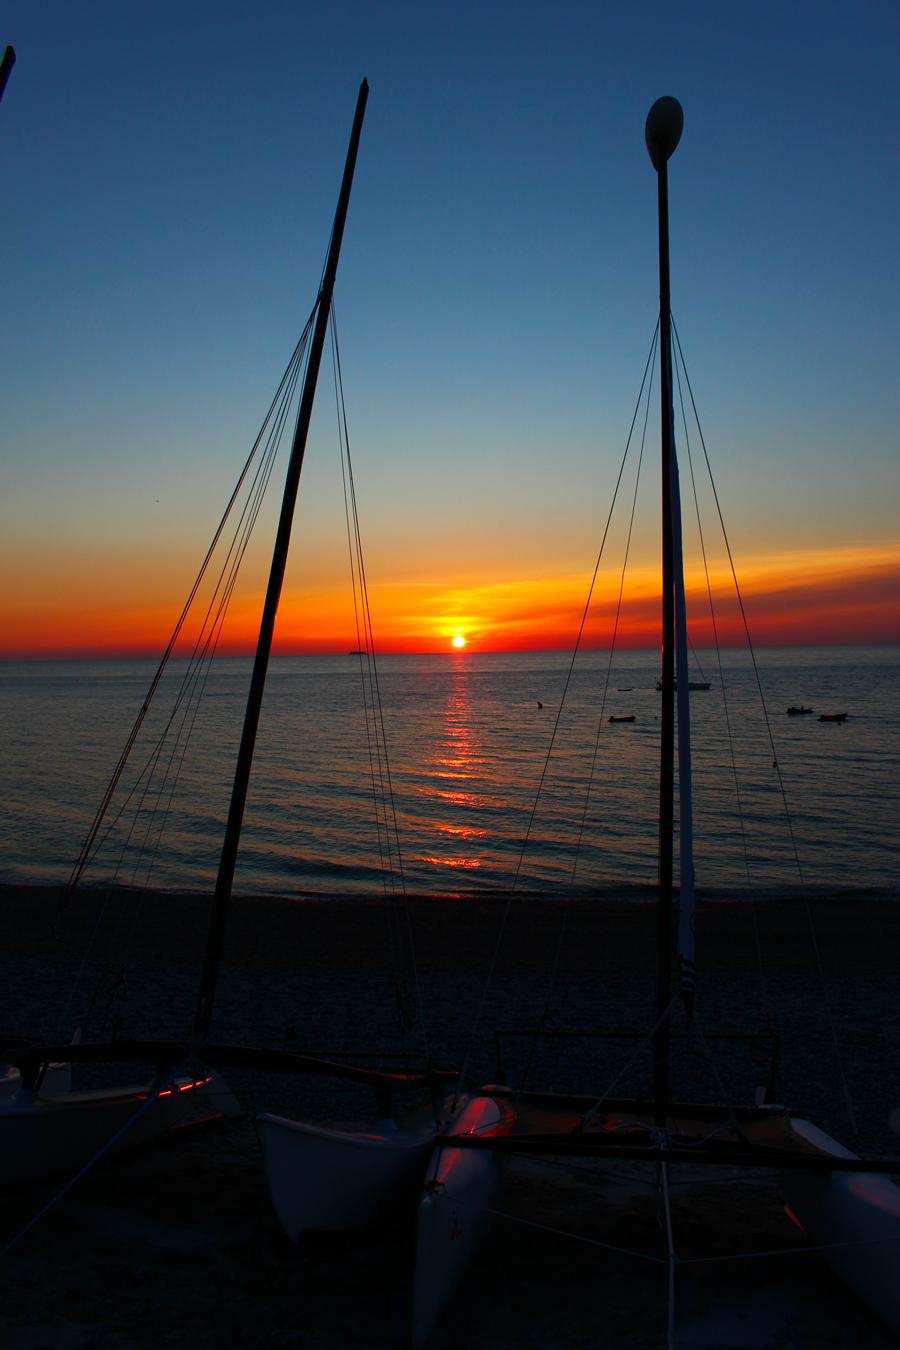 sunset normandie